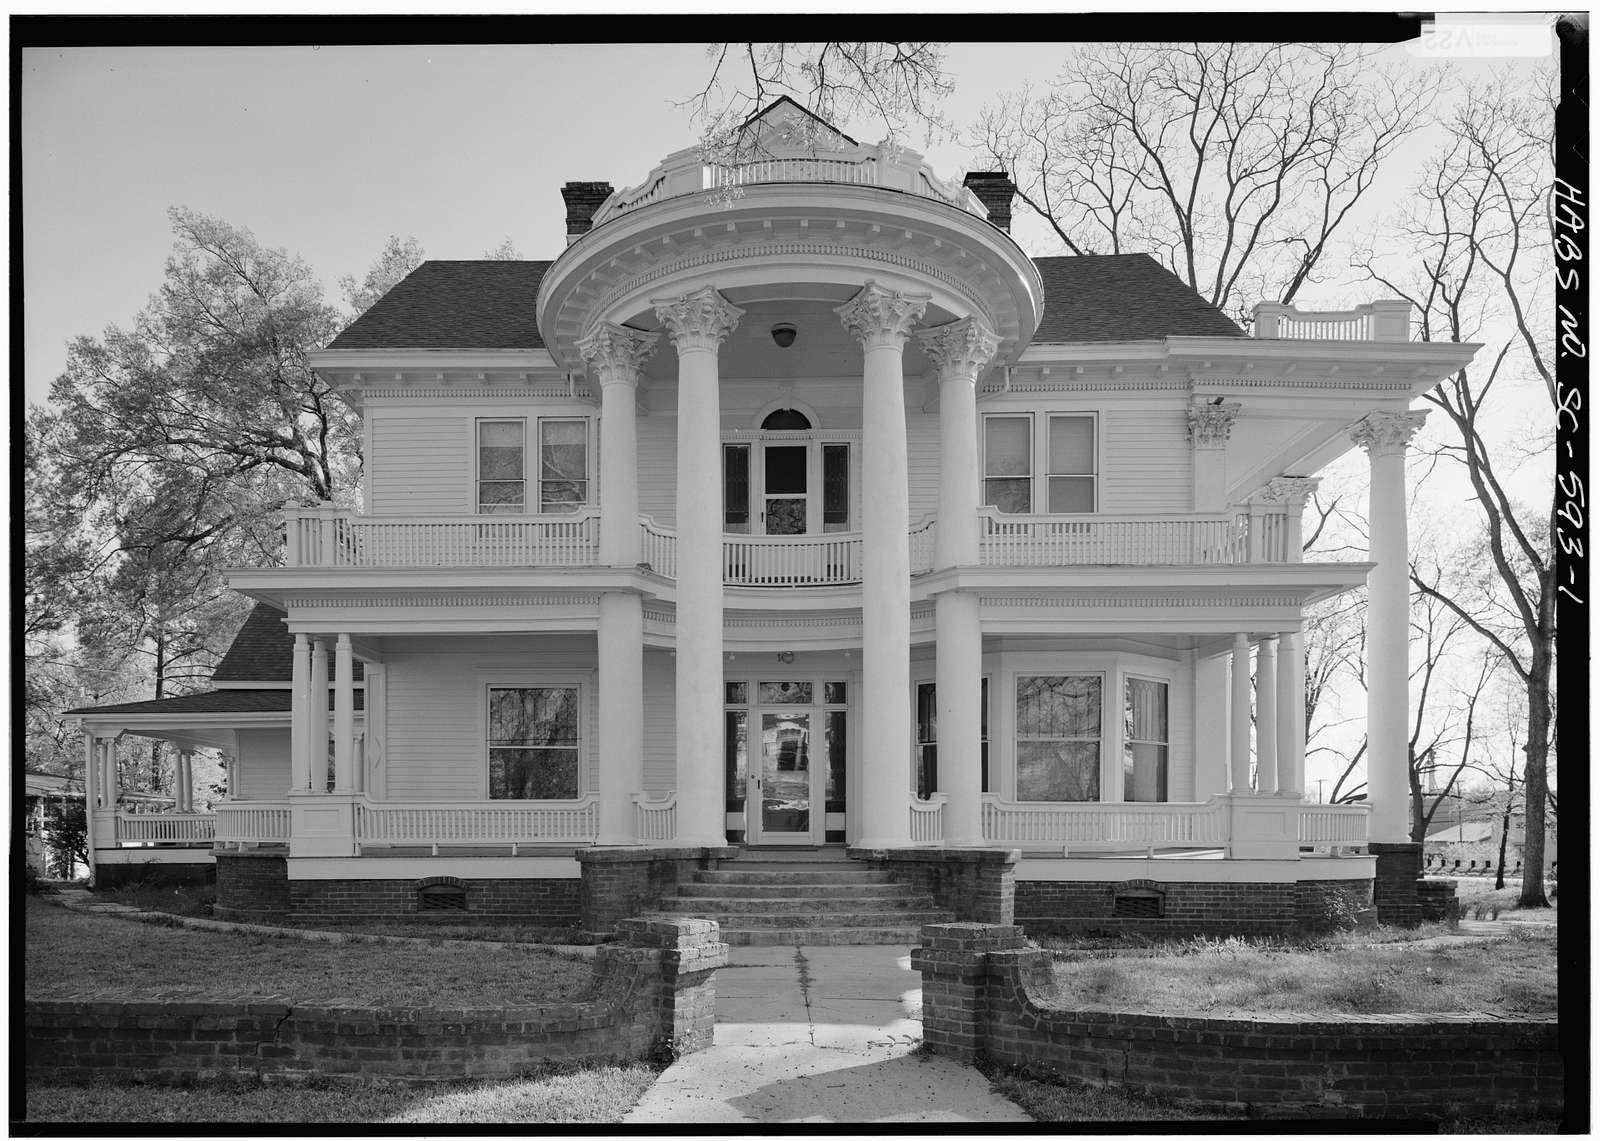 Joseph Banks House, 104 Dantzler Street, Saint Matthews, Calhoun County, SC